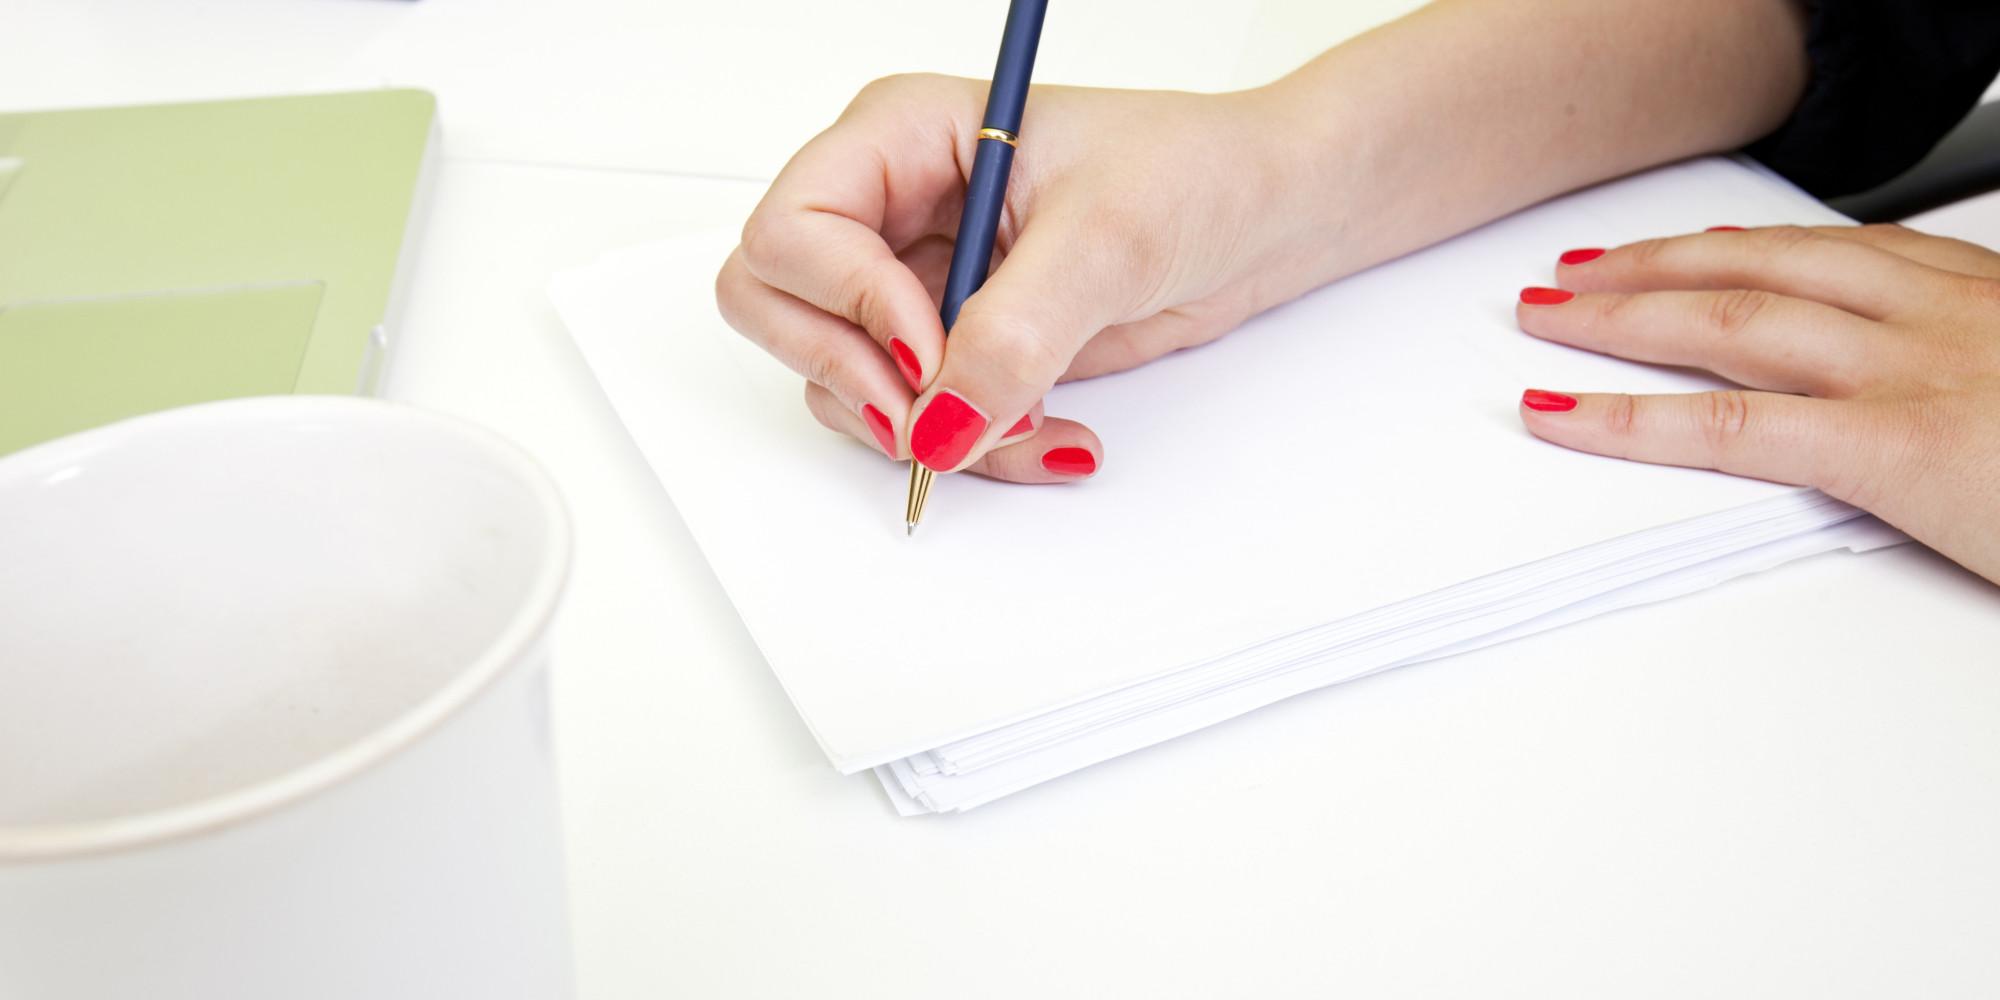 Practical scribendi reviews reviewingwriting Secrets Across The Uk